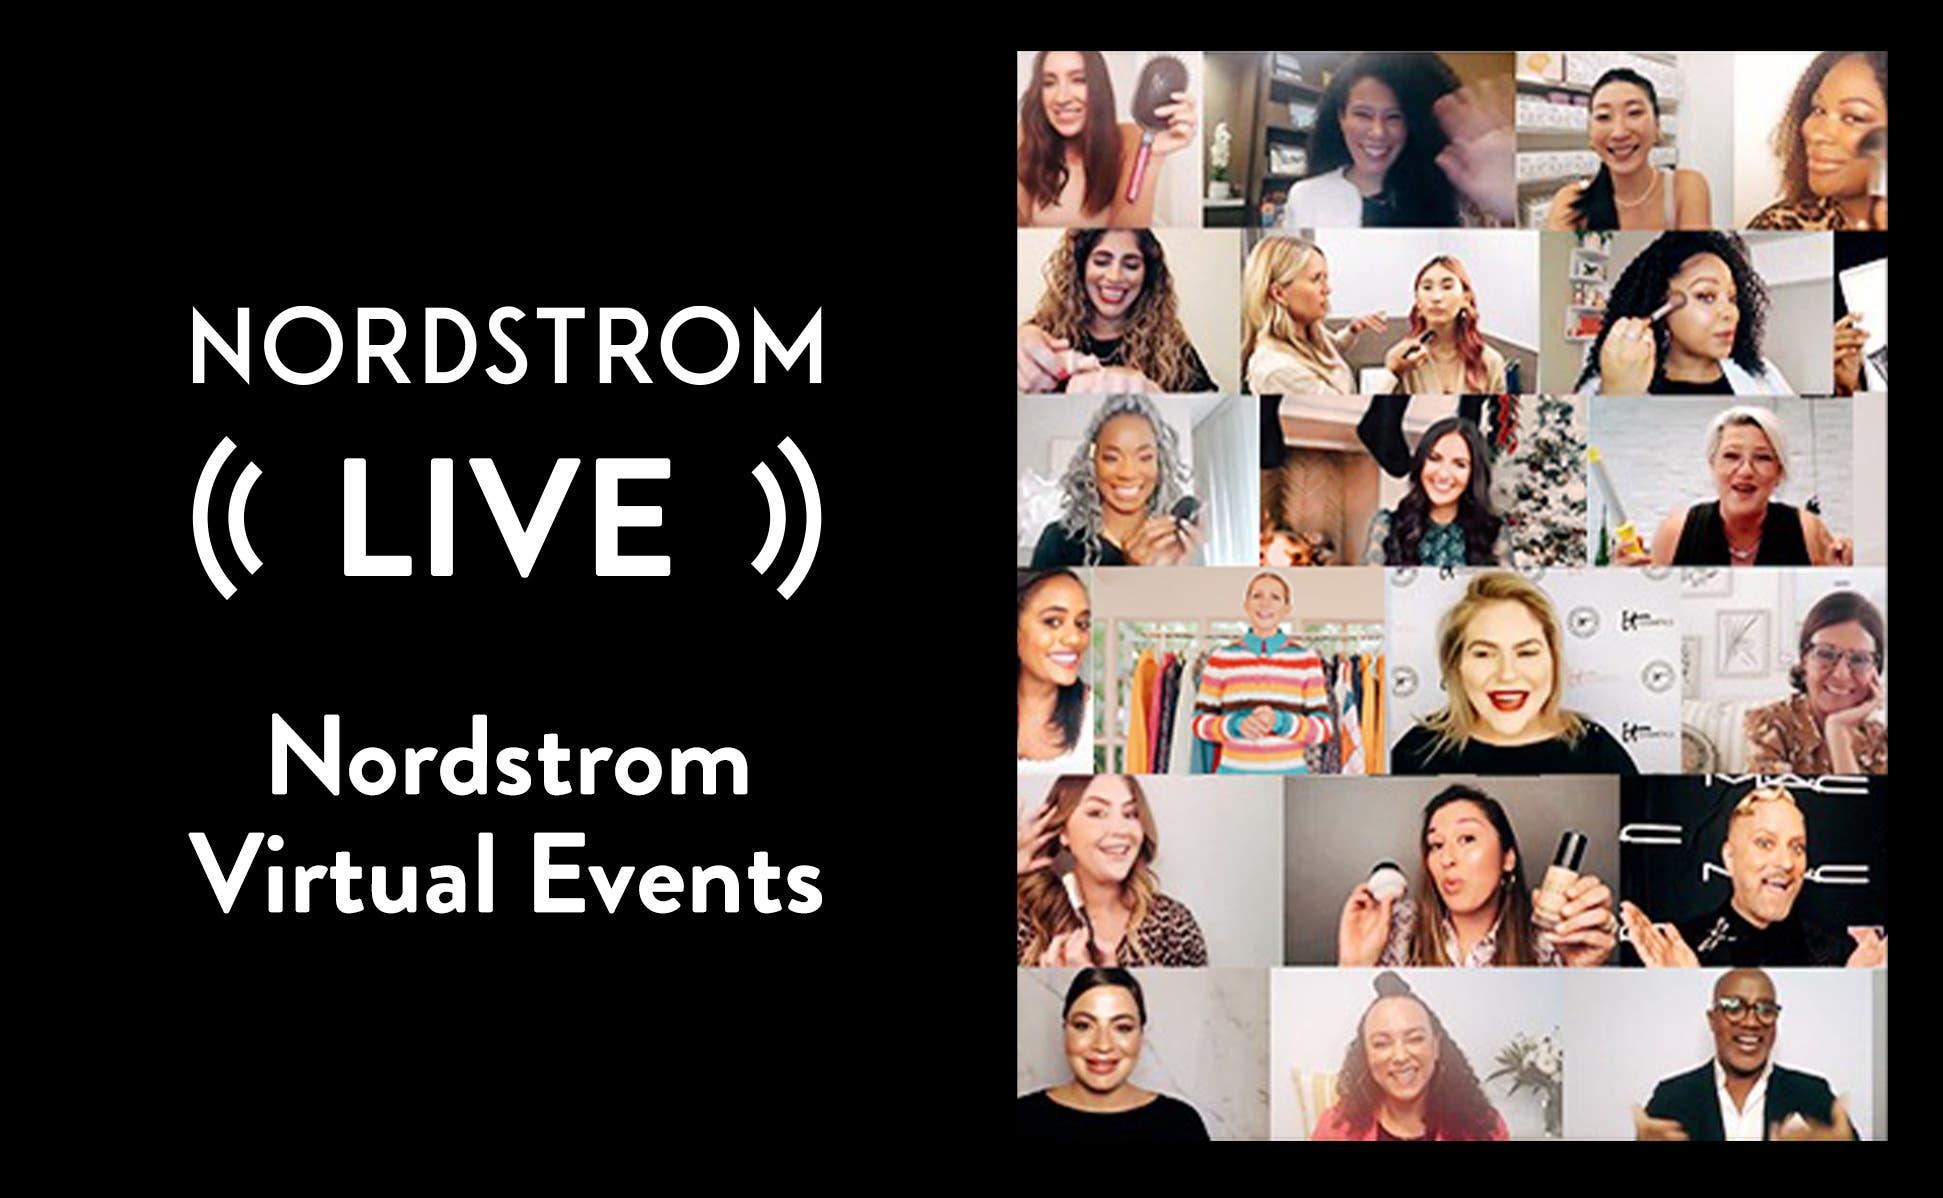 NLIVE: Nordstrom Virtual Eventsimage